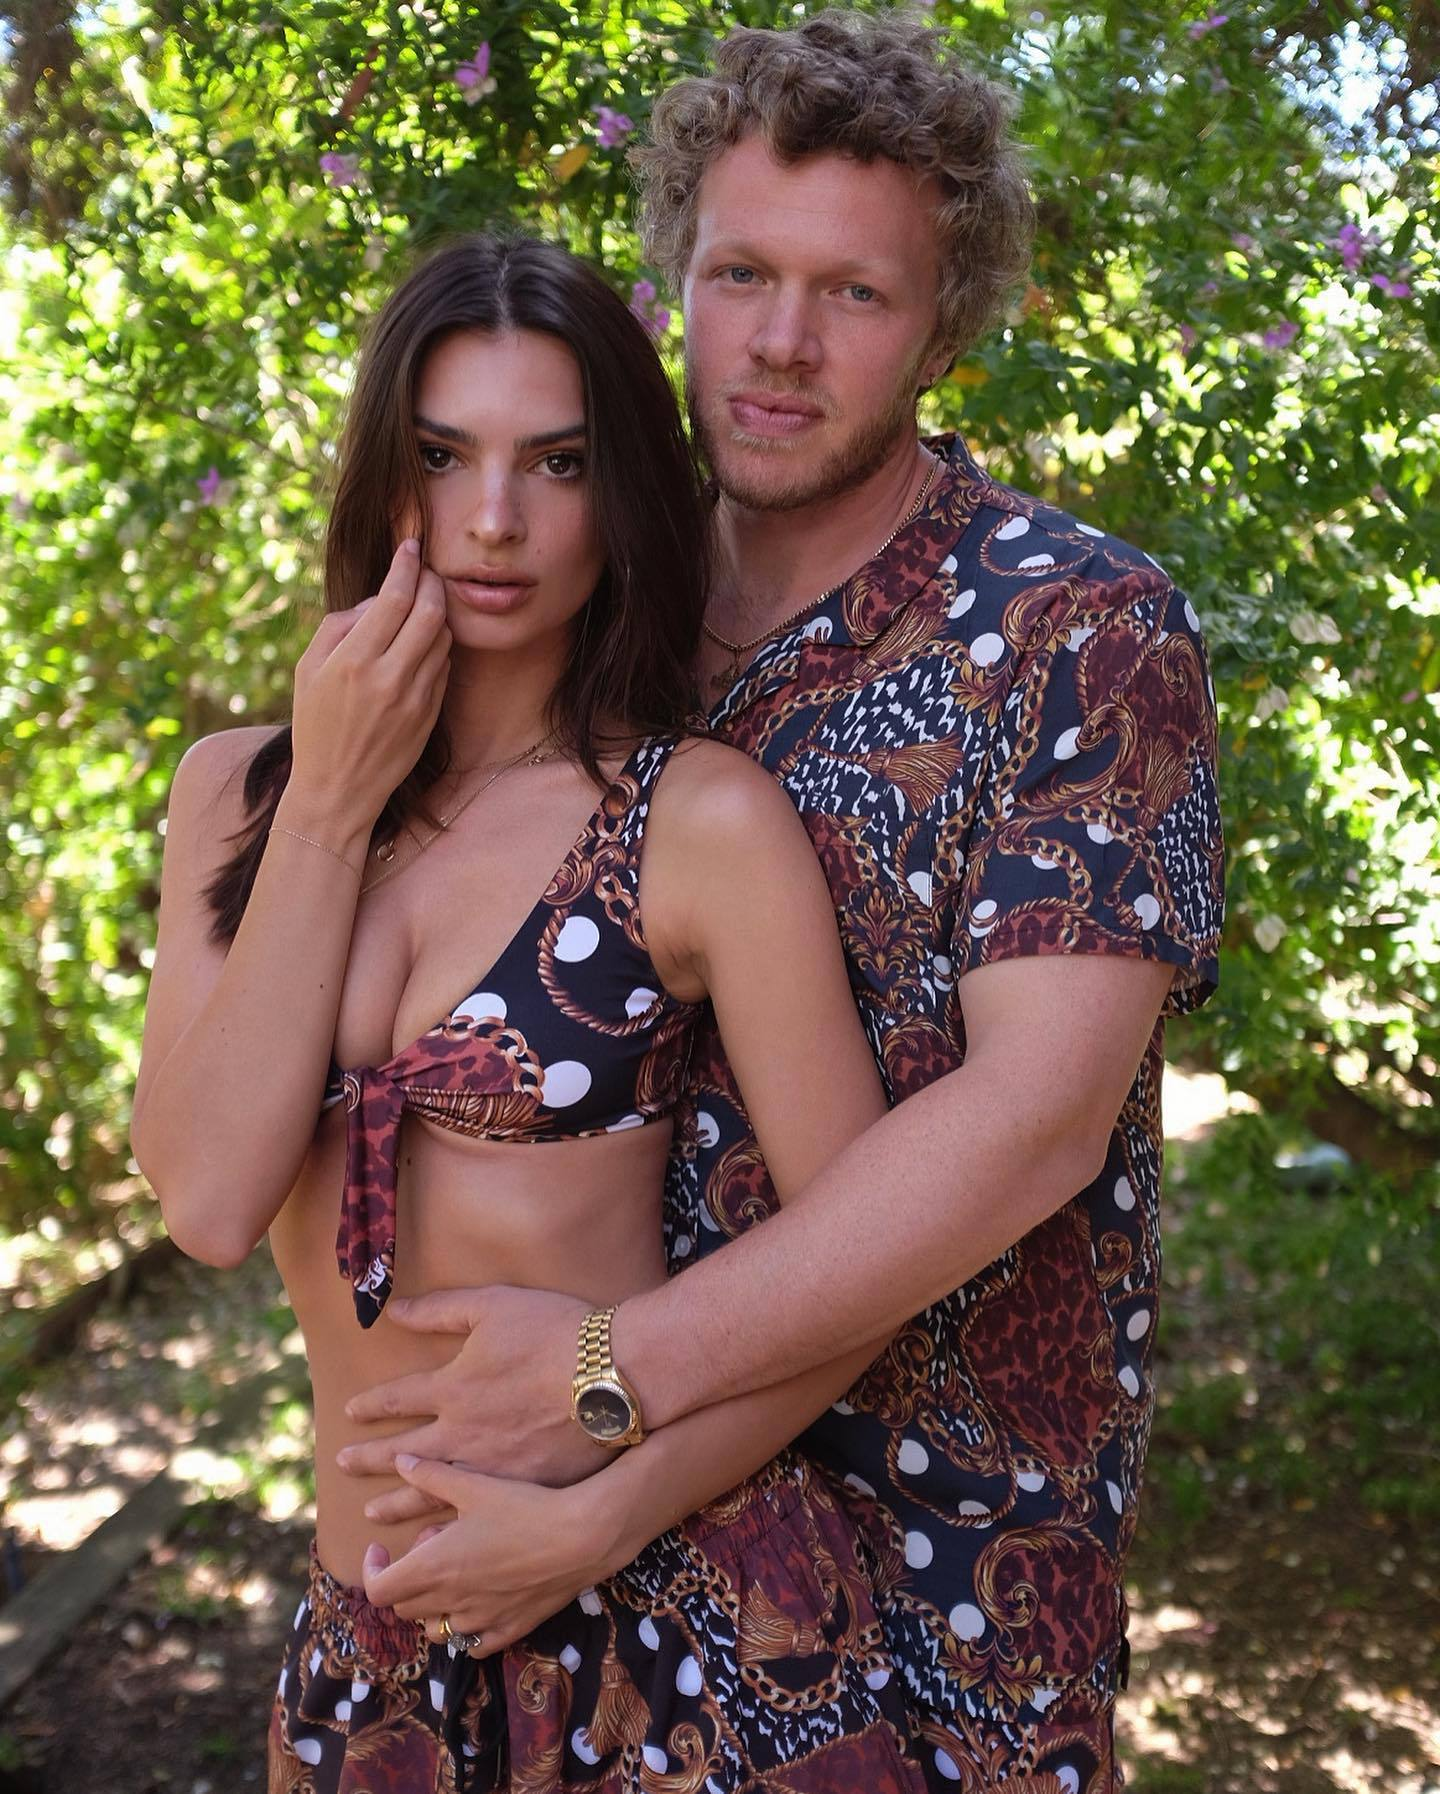 Emily Ratajkowski – Perfect Boobs In Sexy Braless Photoshoot For Inamorata Collection 0009